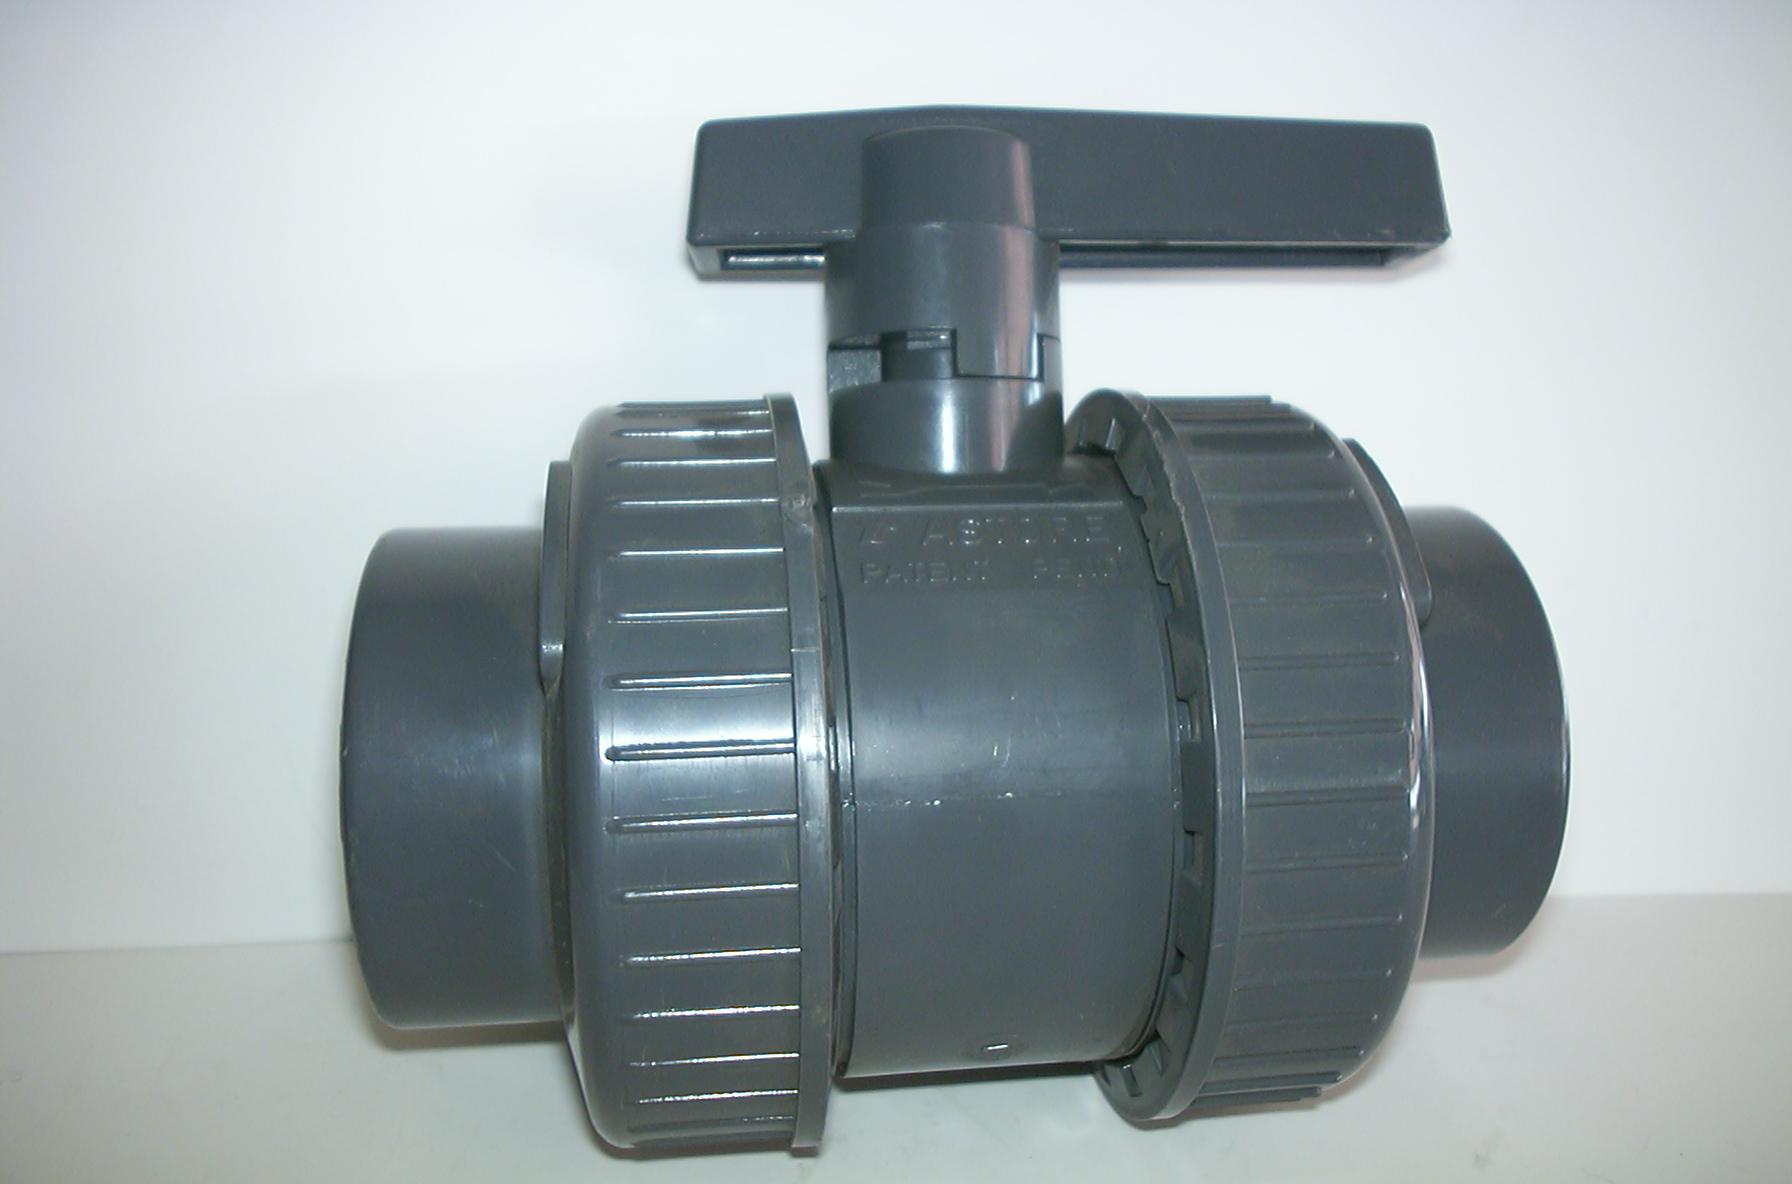 Accessori irrigazione f i p a forniture per impianti for Accessori irrigazione